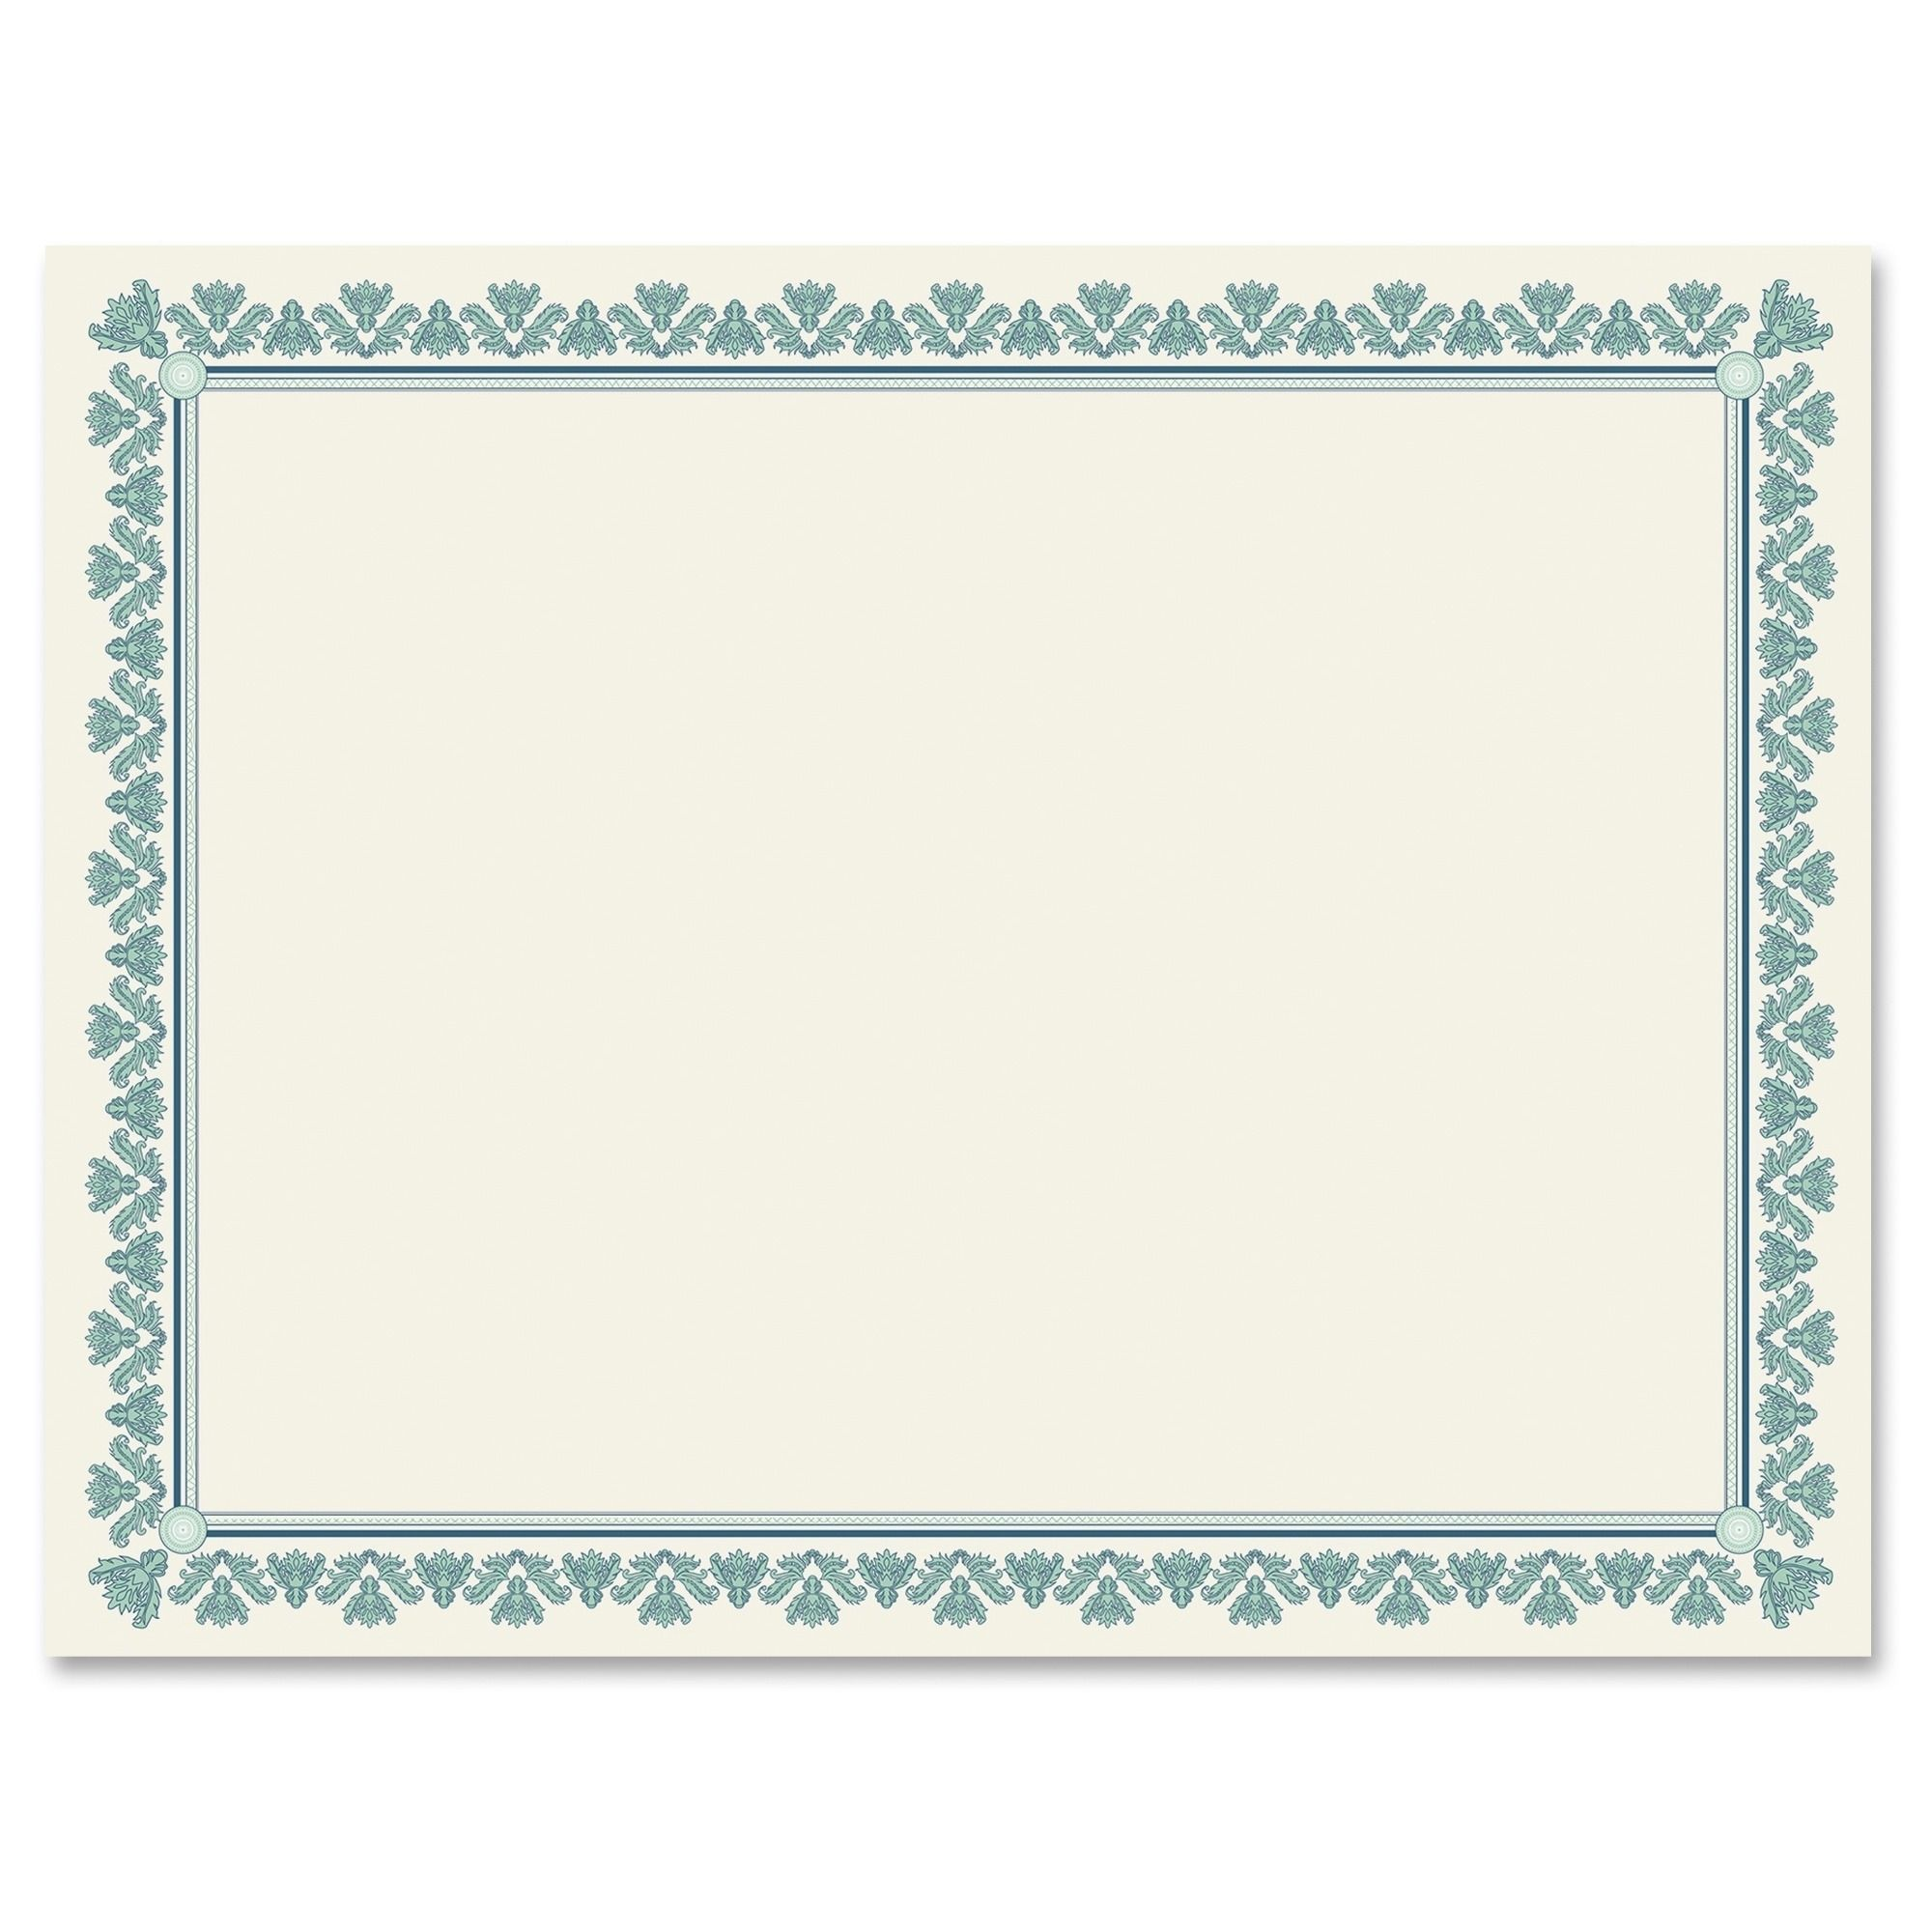 Geographics Fleur Border Blank Certificates - Aquamarine (25/Pack